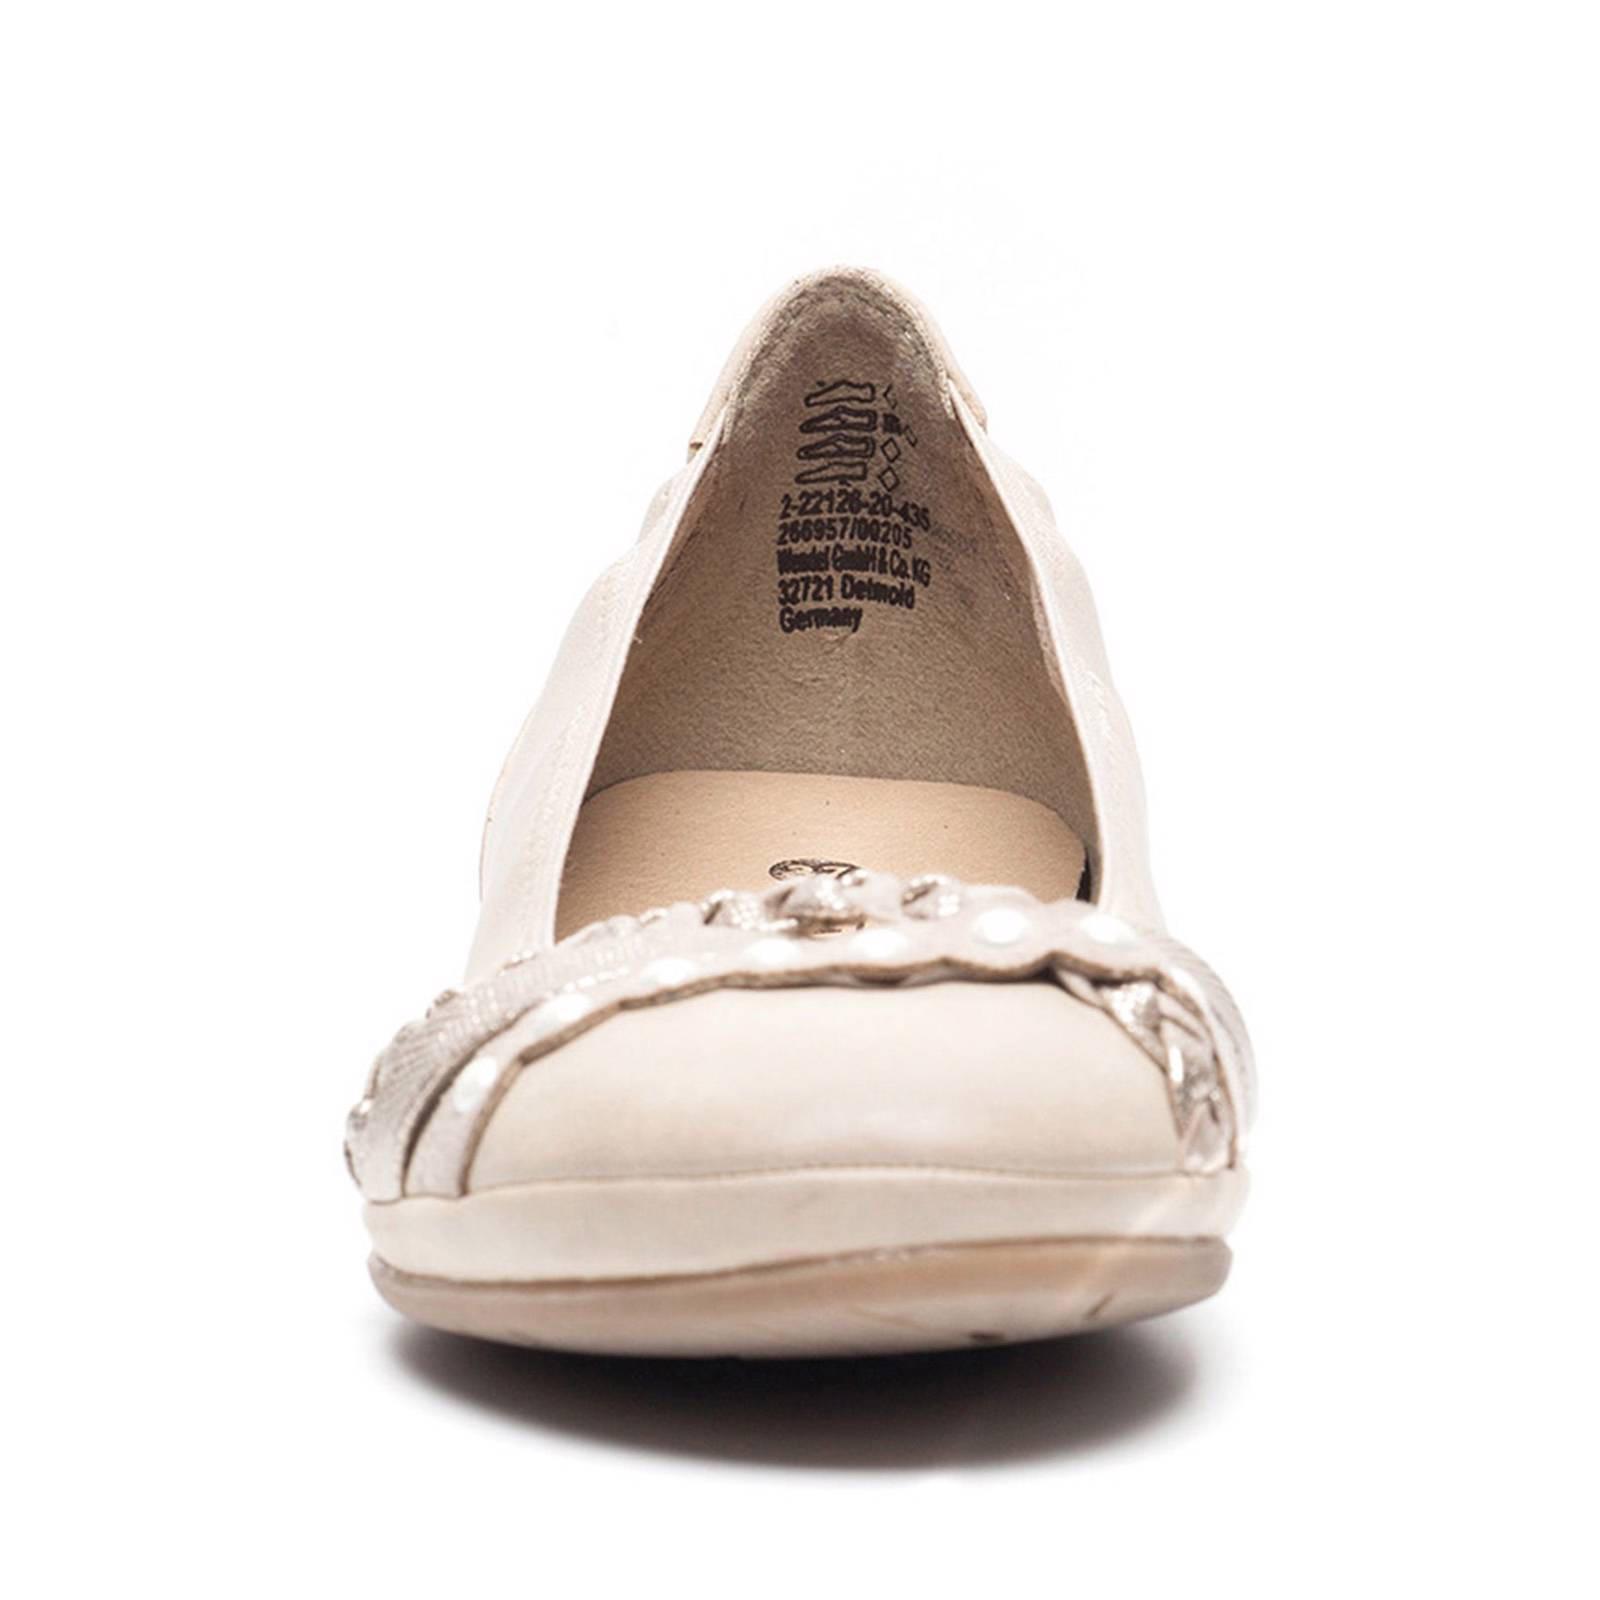 Scapino Nova ballerina's | wehkamp